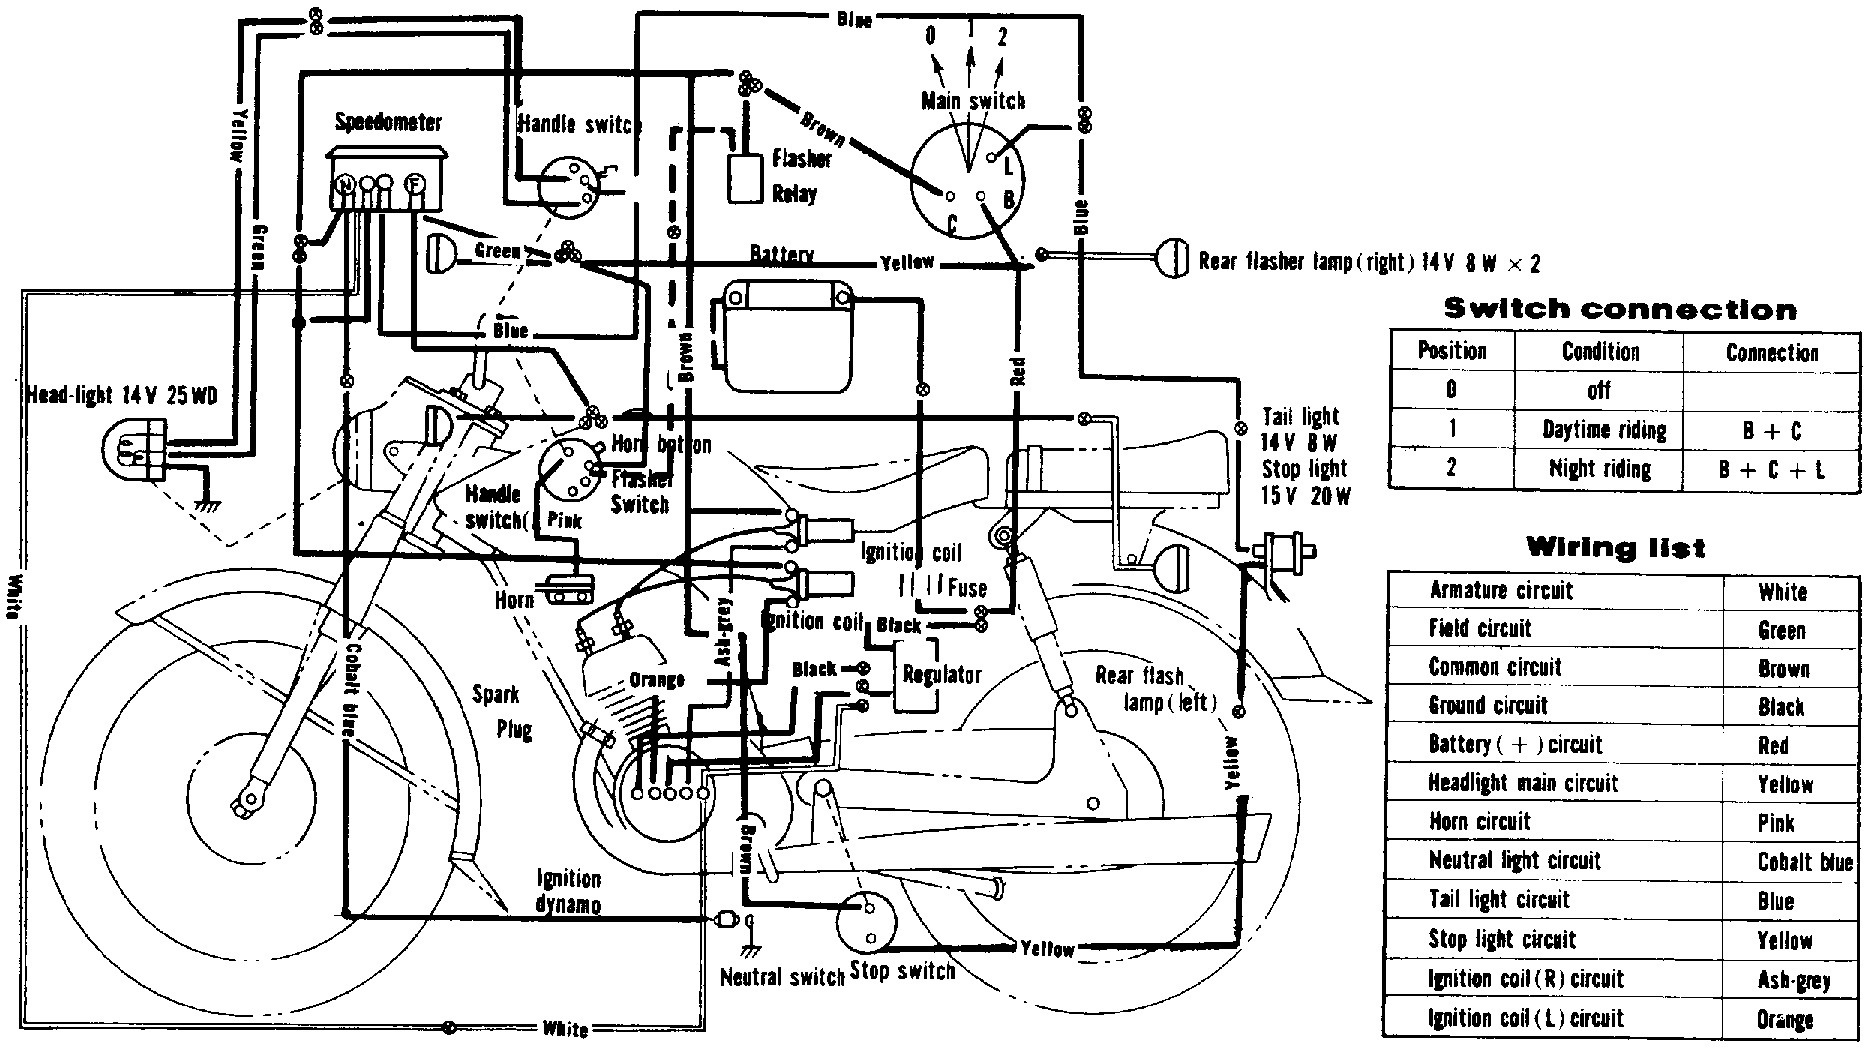 hight resolution of yamaha engine schematics wiring diagram paper1971 yamaha engine diagram 19